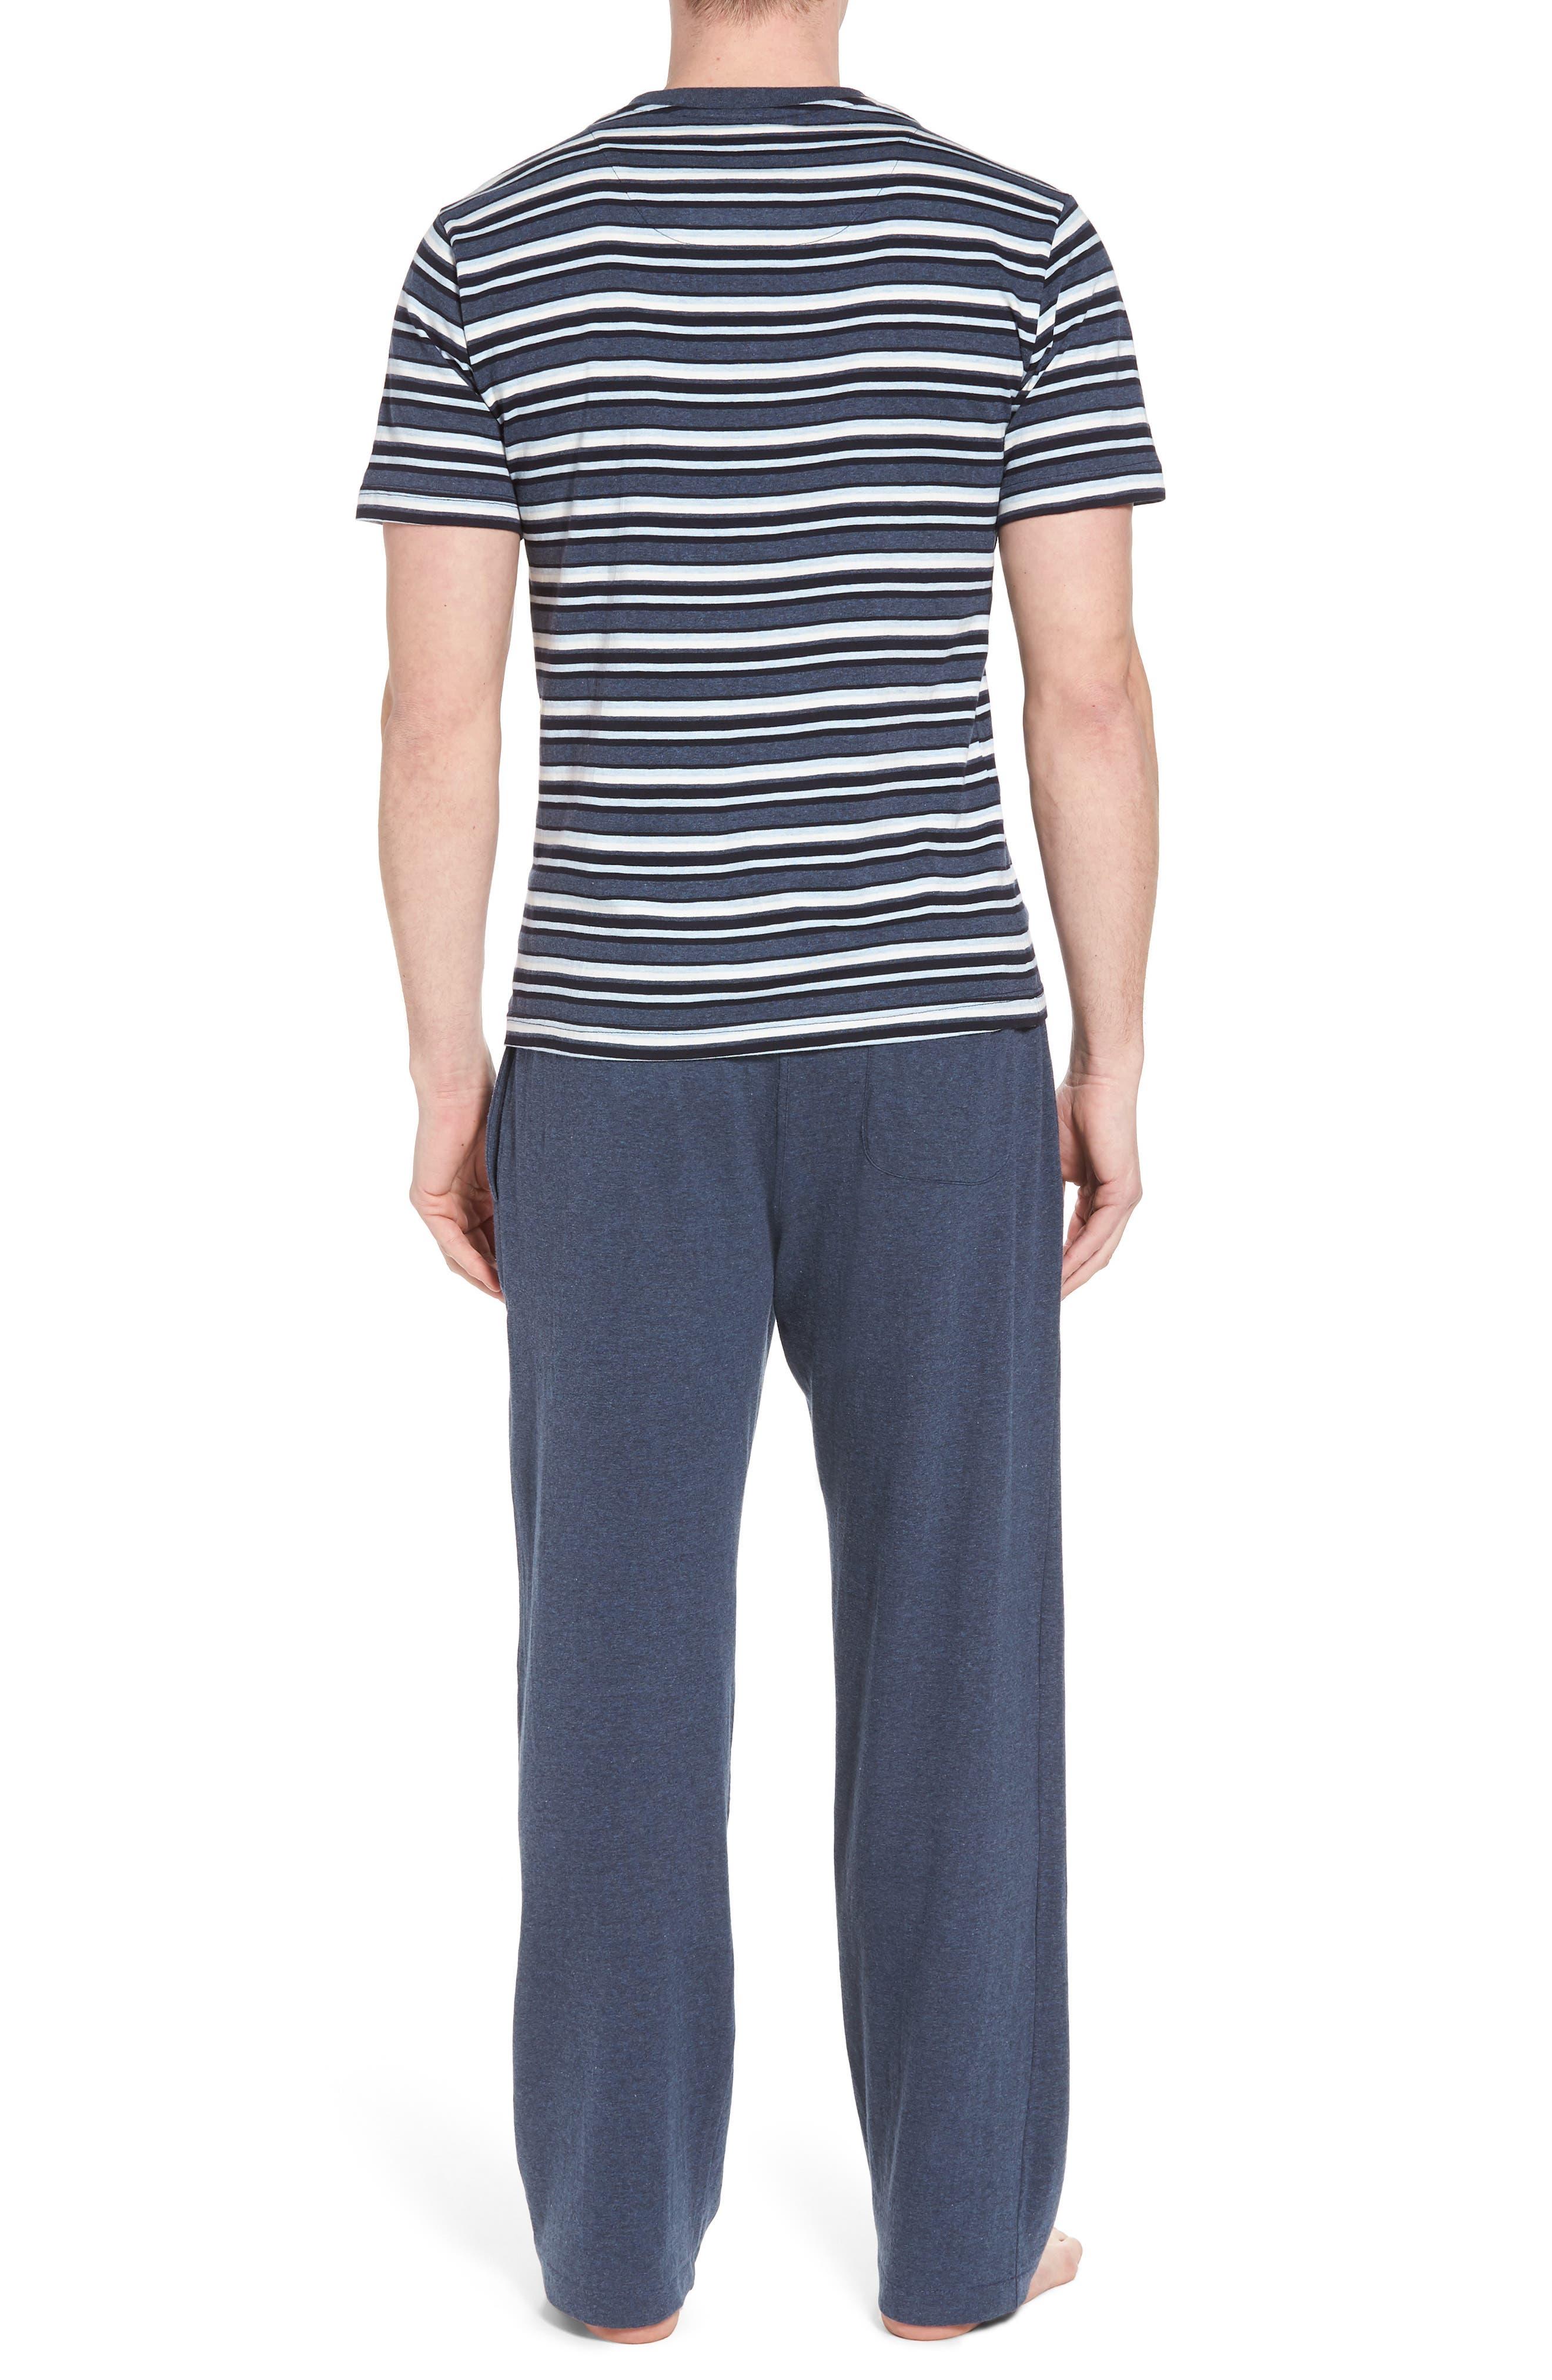 Majetic International Sleep On It Pajama Set,                             Alternate thumbnail 2, color,                             Alfresco Stripe